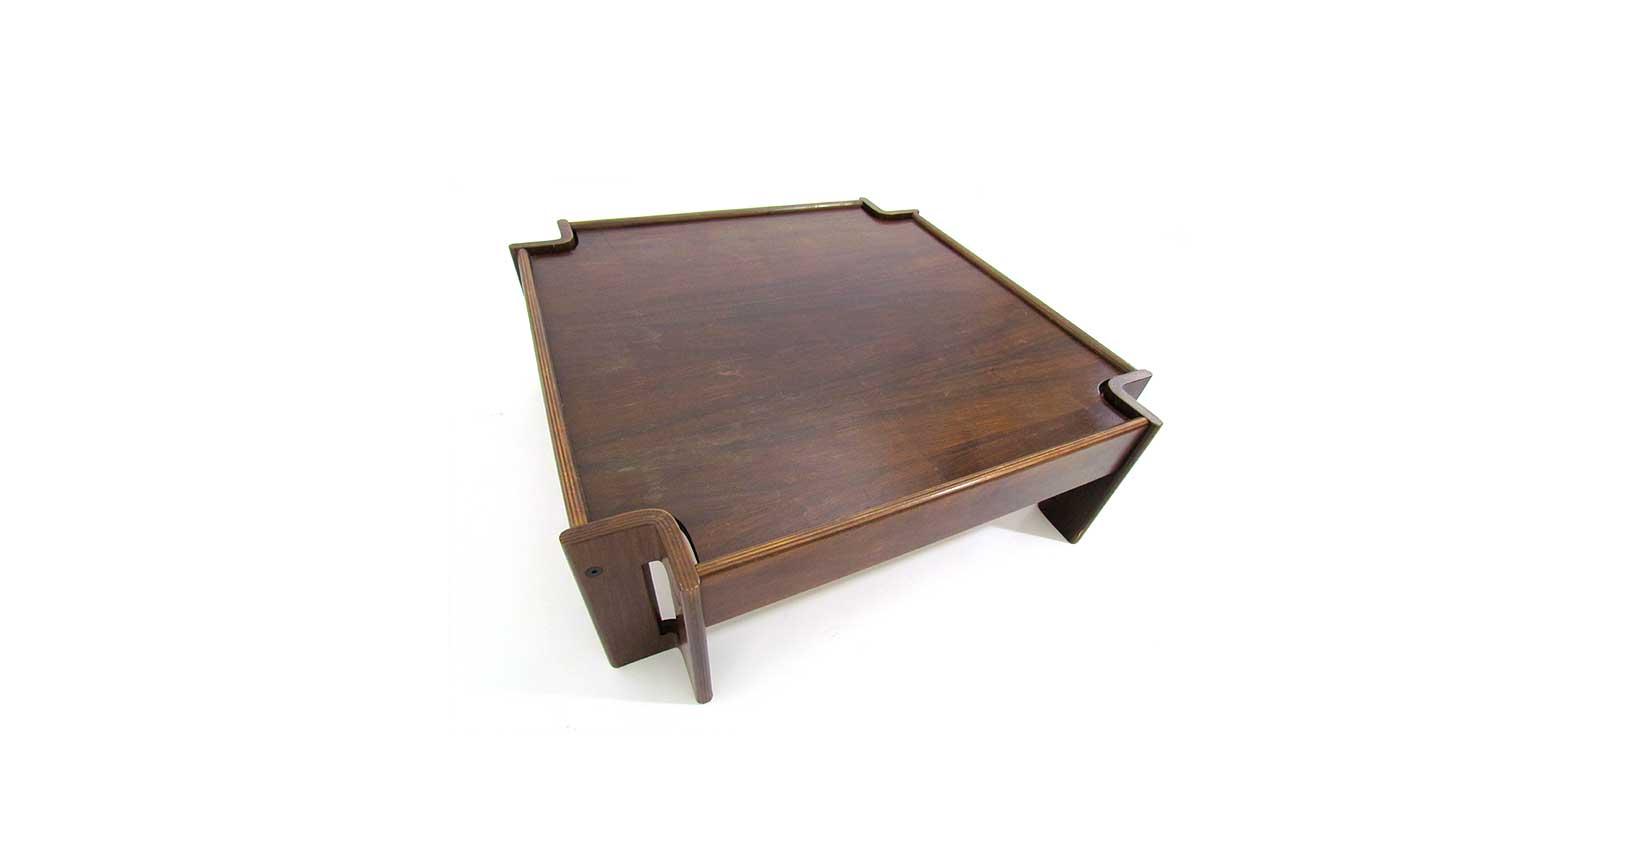 zelda table wood poltronova sergio asti design coffee iconicdesign iconic design furniture vintage